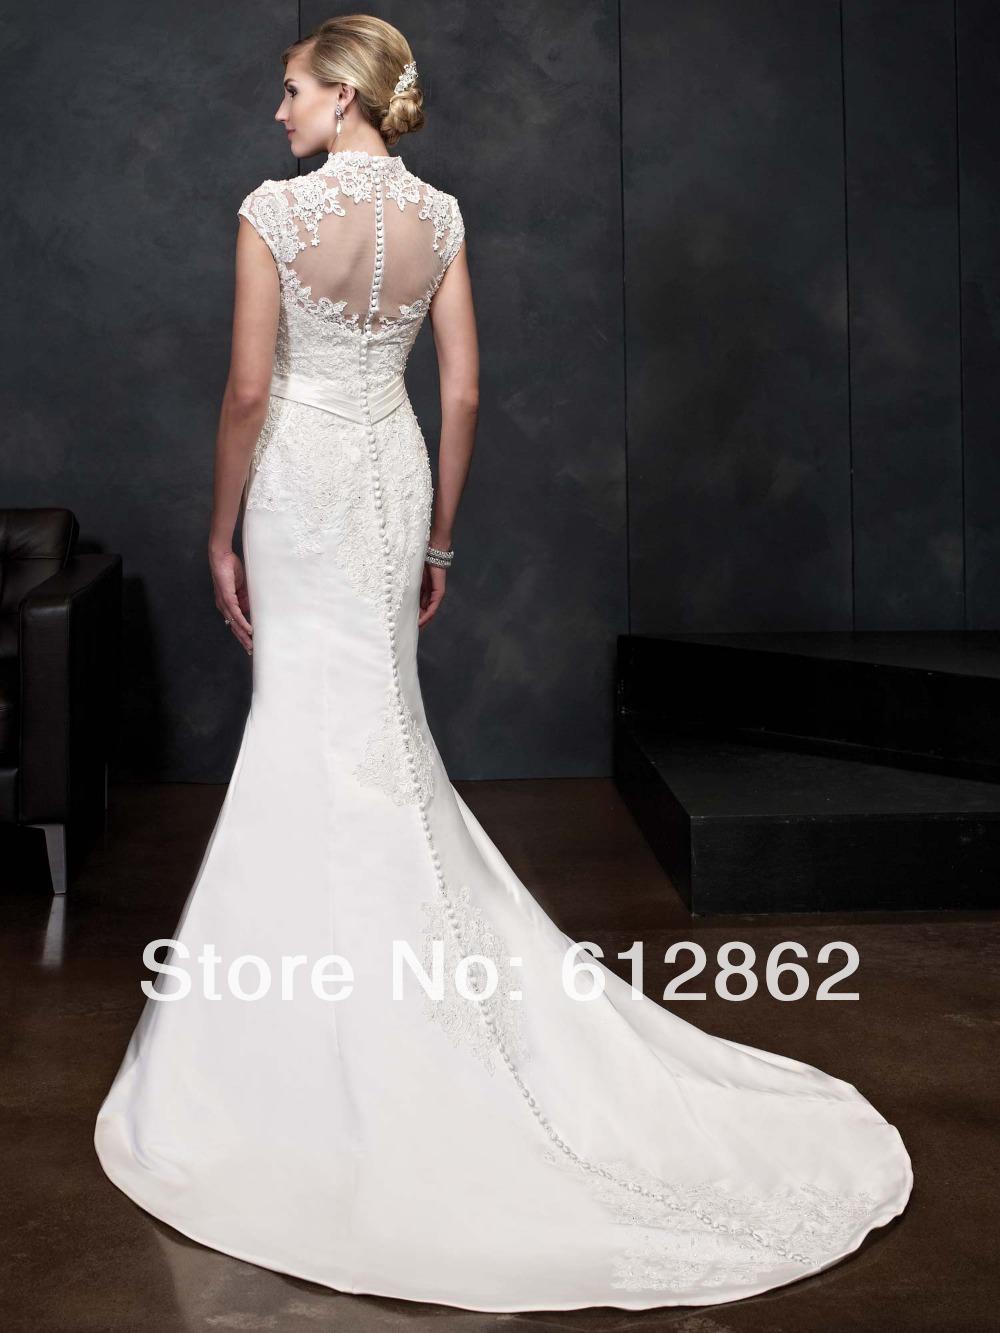 Wedding Wedding Dress Train lace mermaid wedding dress long train gowns and ideas geous off the shoulder detachable dresses long